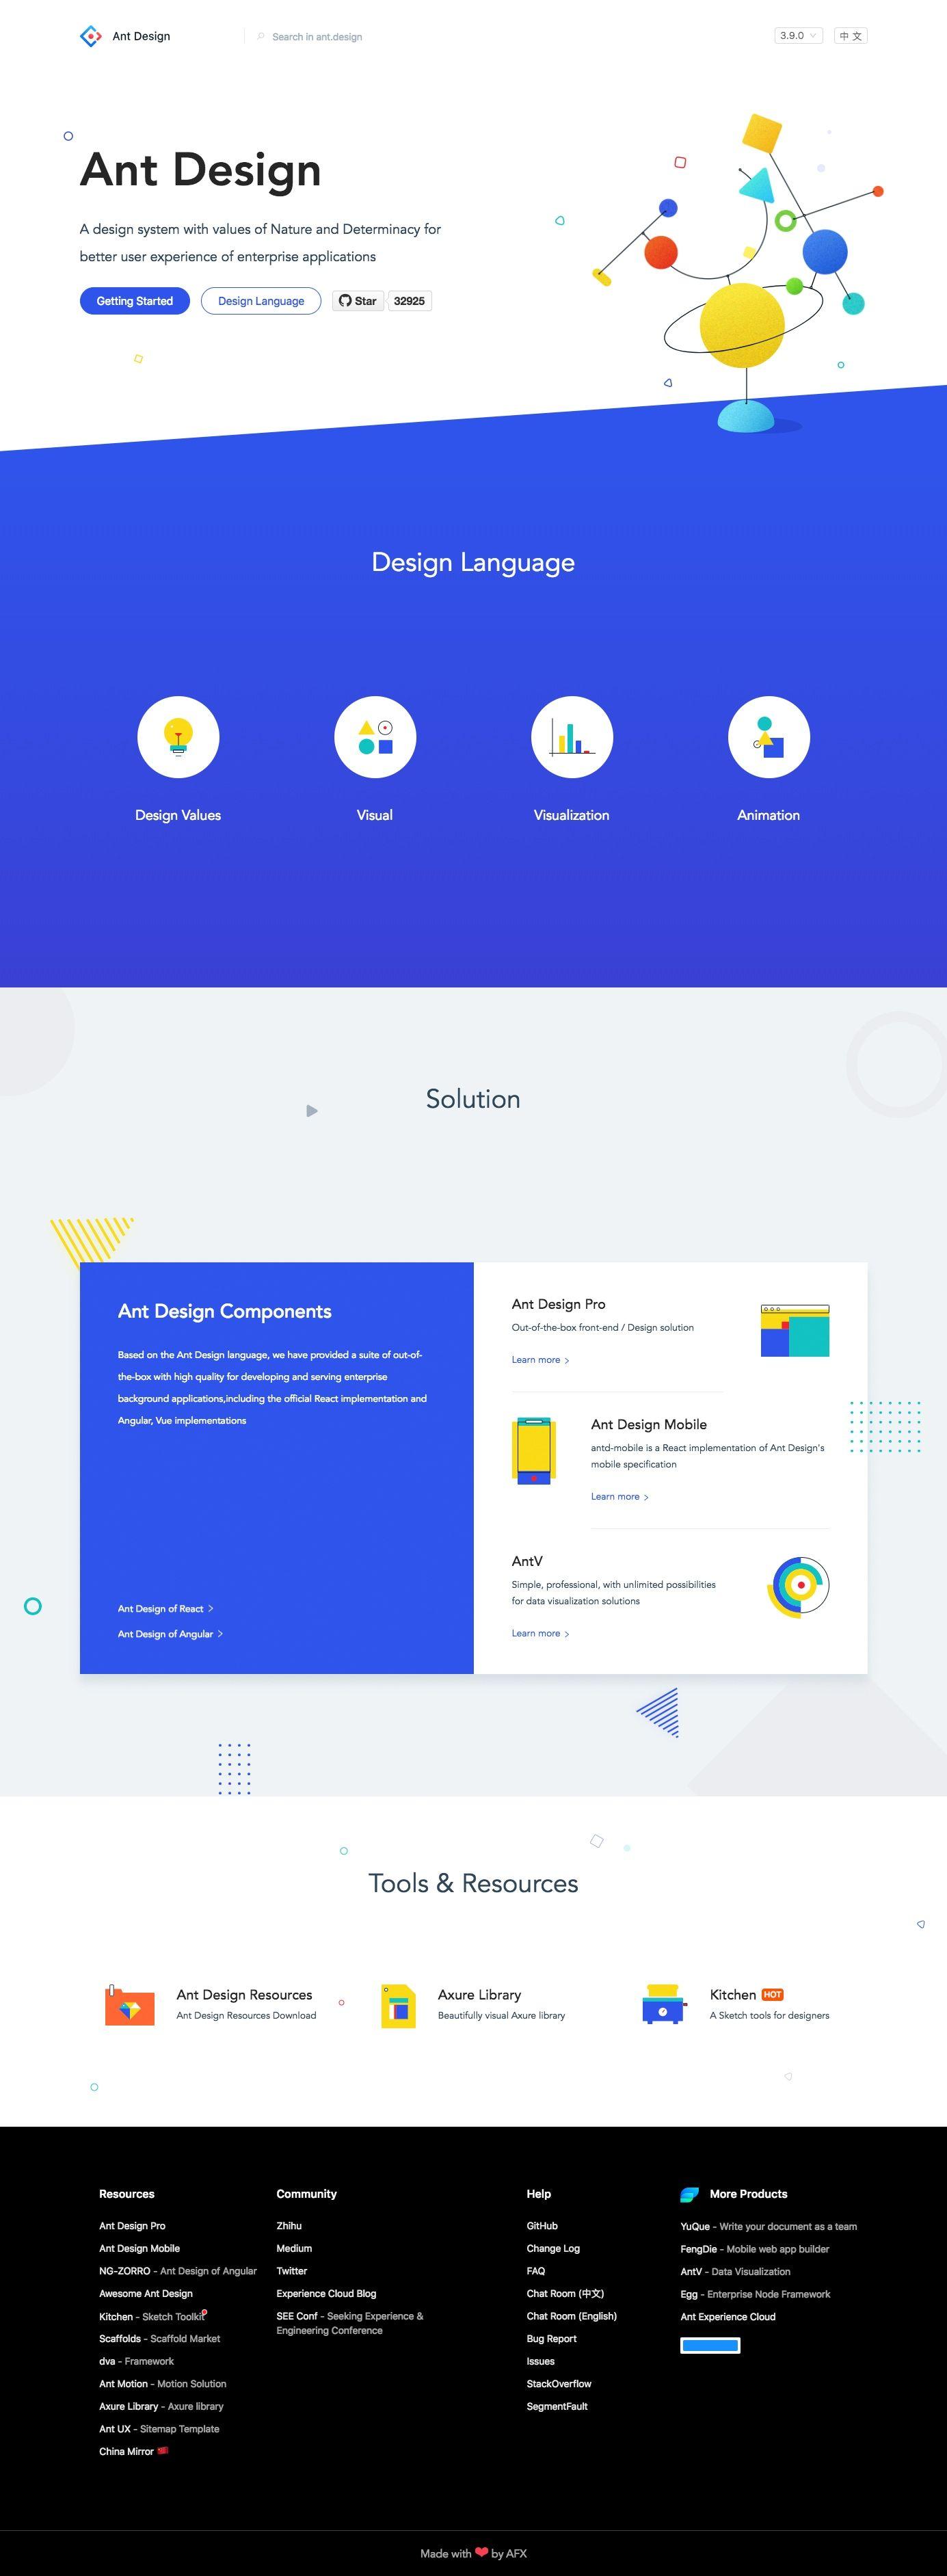 ant design landing page design inspiration web design quotes